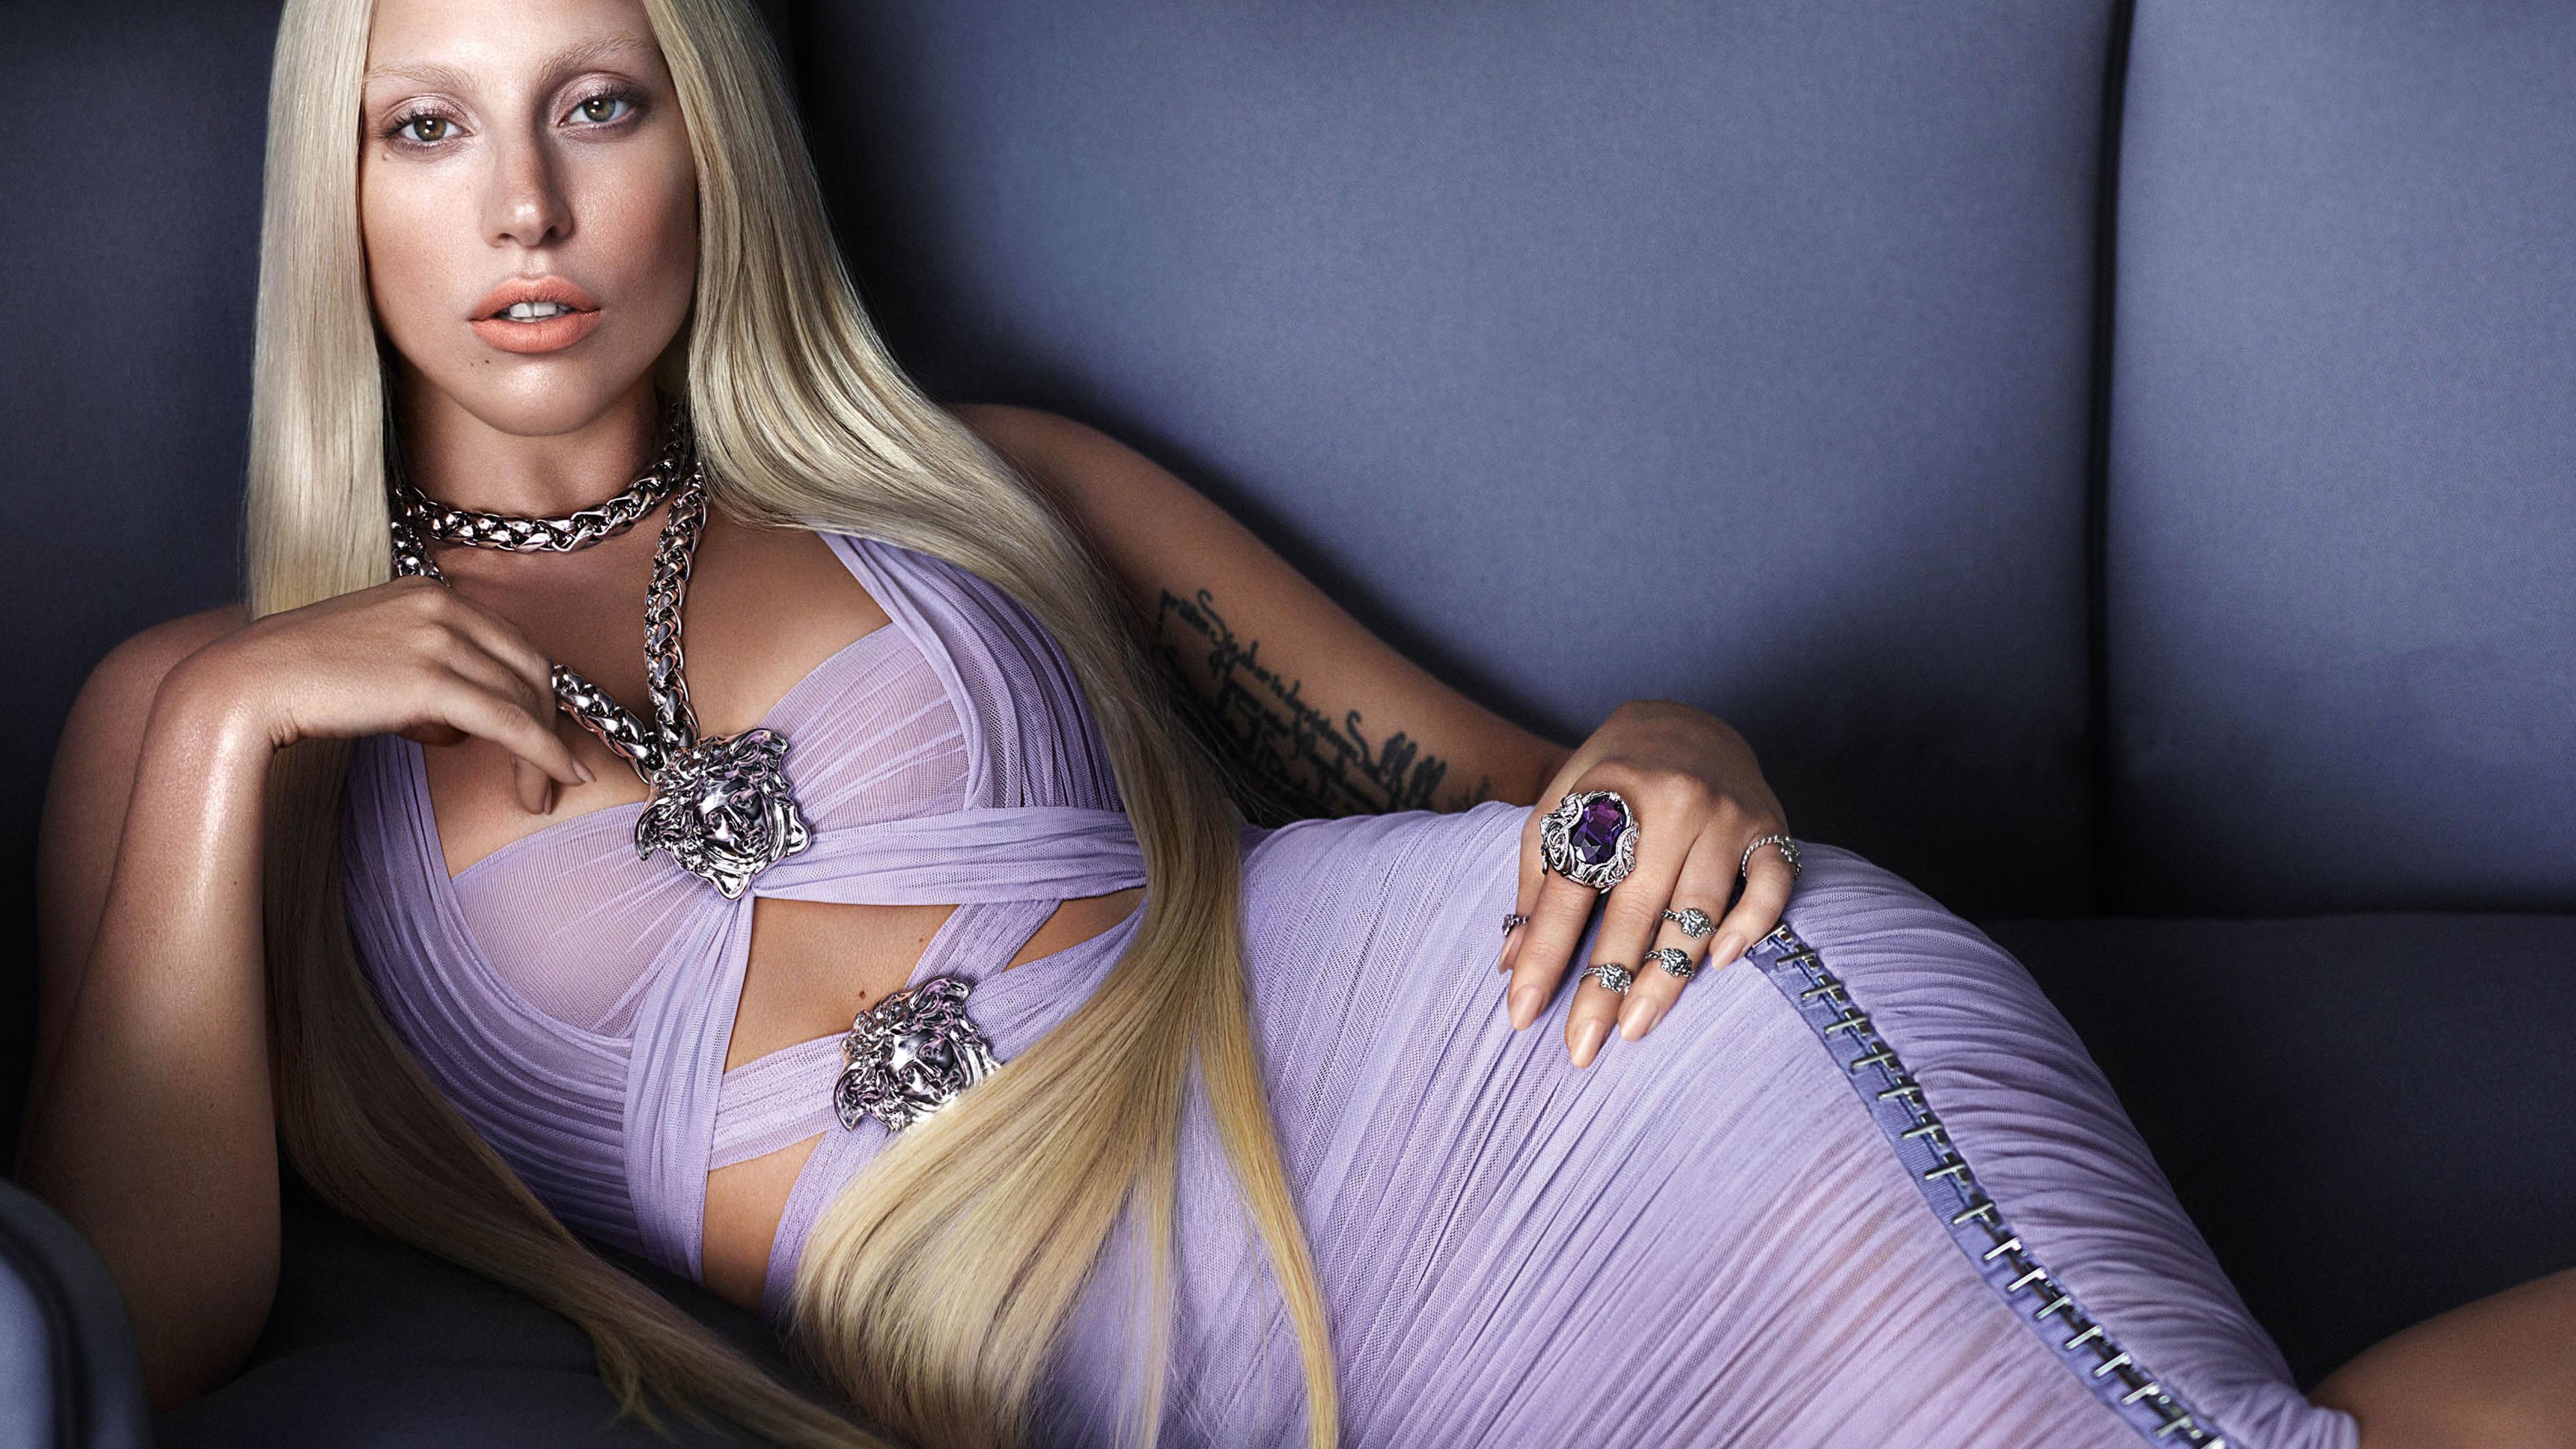 lady gaga for versace 1536947514 - Lady Gaga For Versace - singer wallpapers, music wallpapers, lady gaga wallpapers, hd-wallpapers, girls wallpapers, celebrities wallpapers, 5k wallpapers, 4k-wallpapers